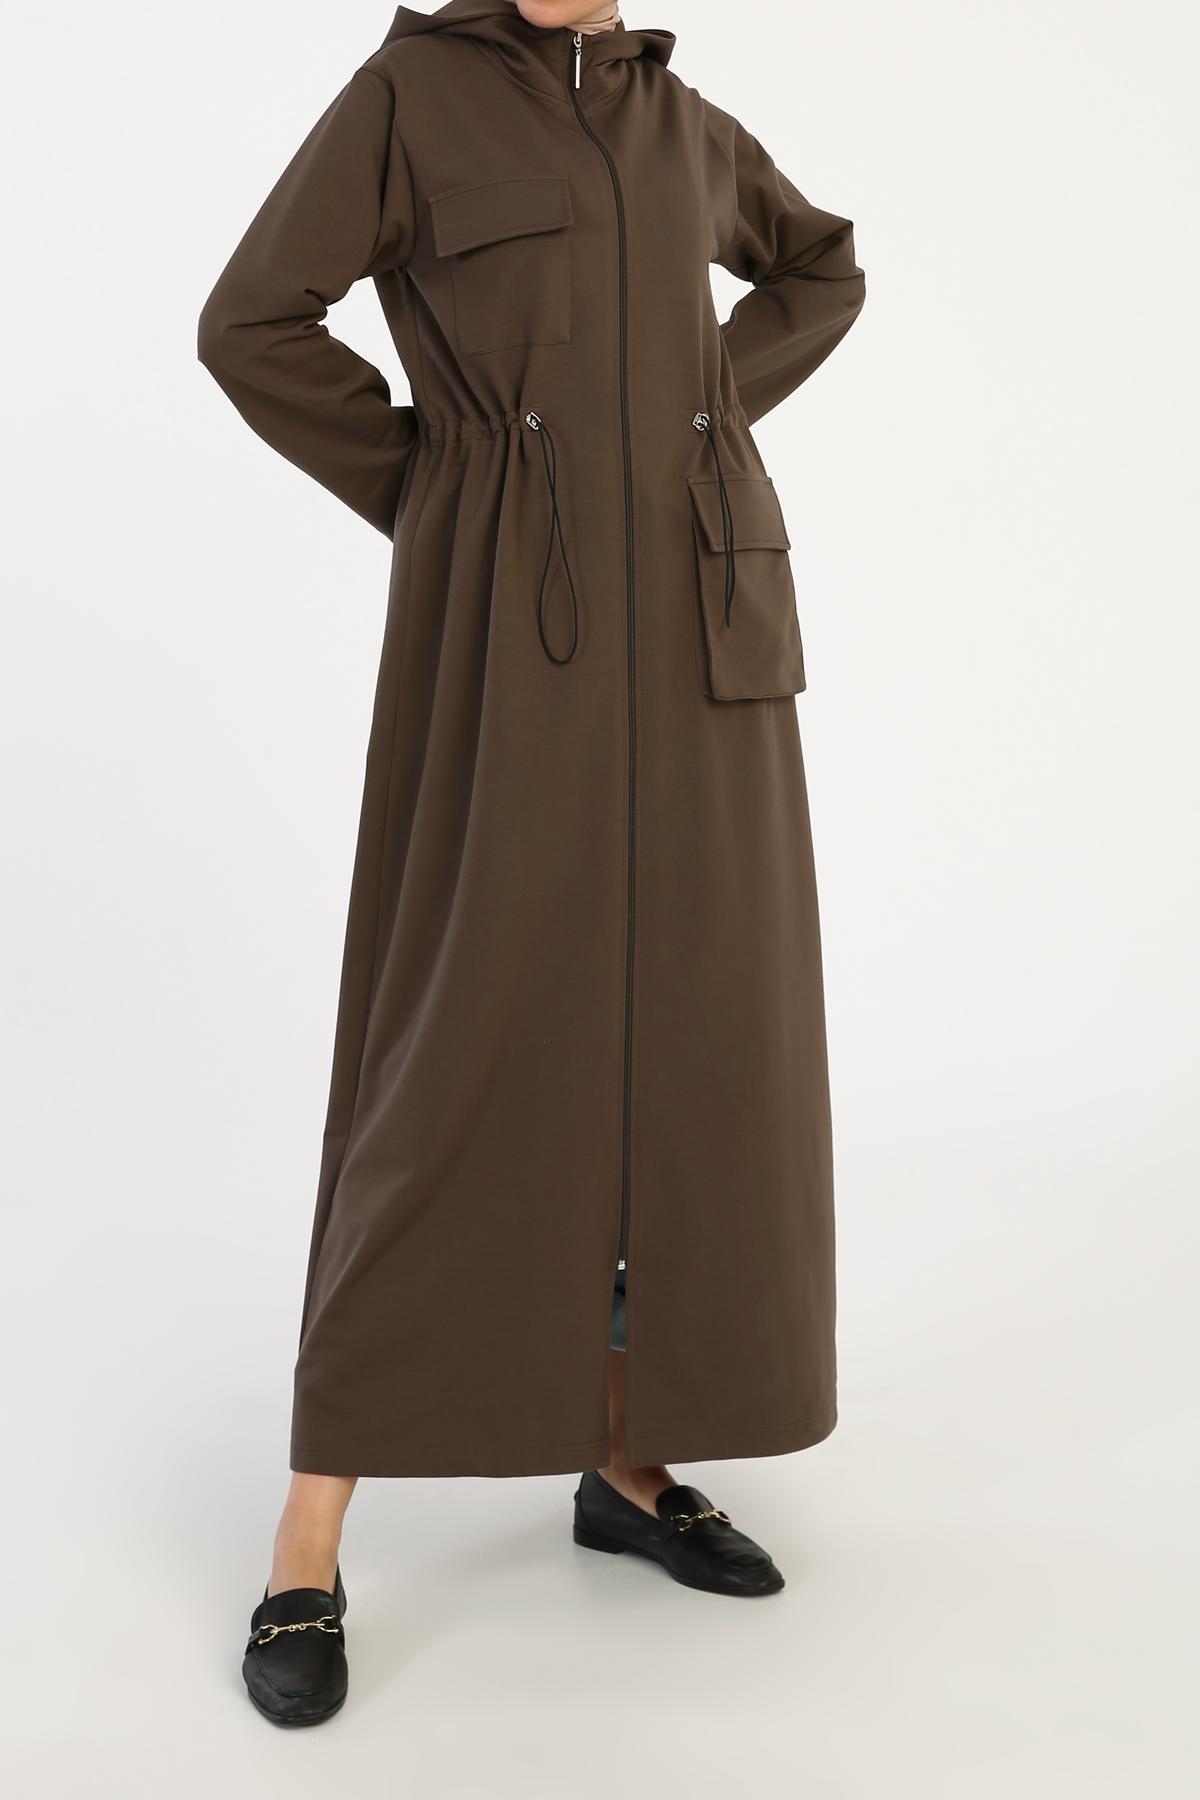 Elastic Waist Pocket Zippered Abaya